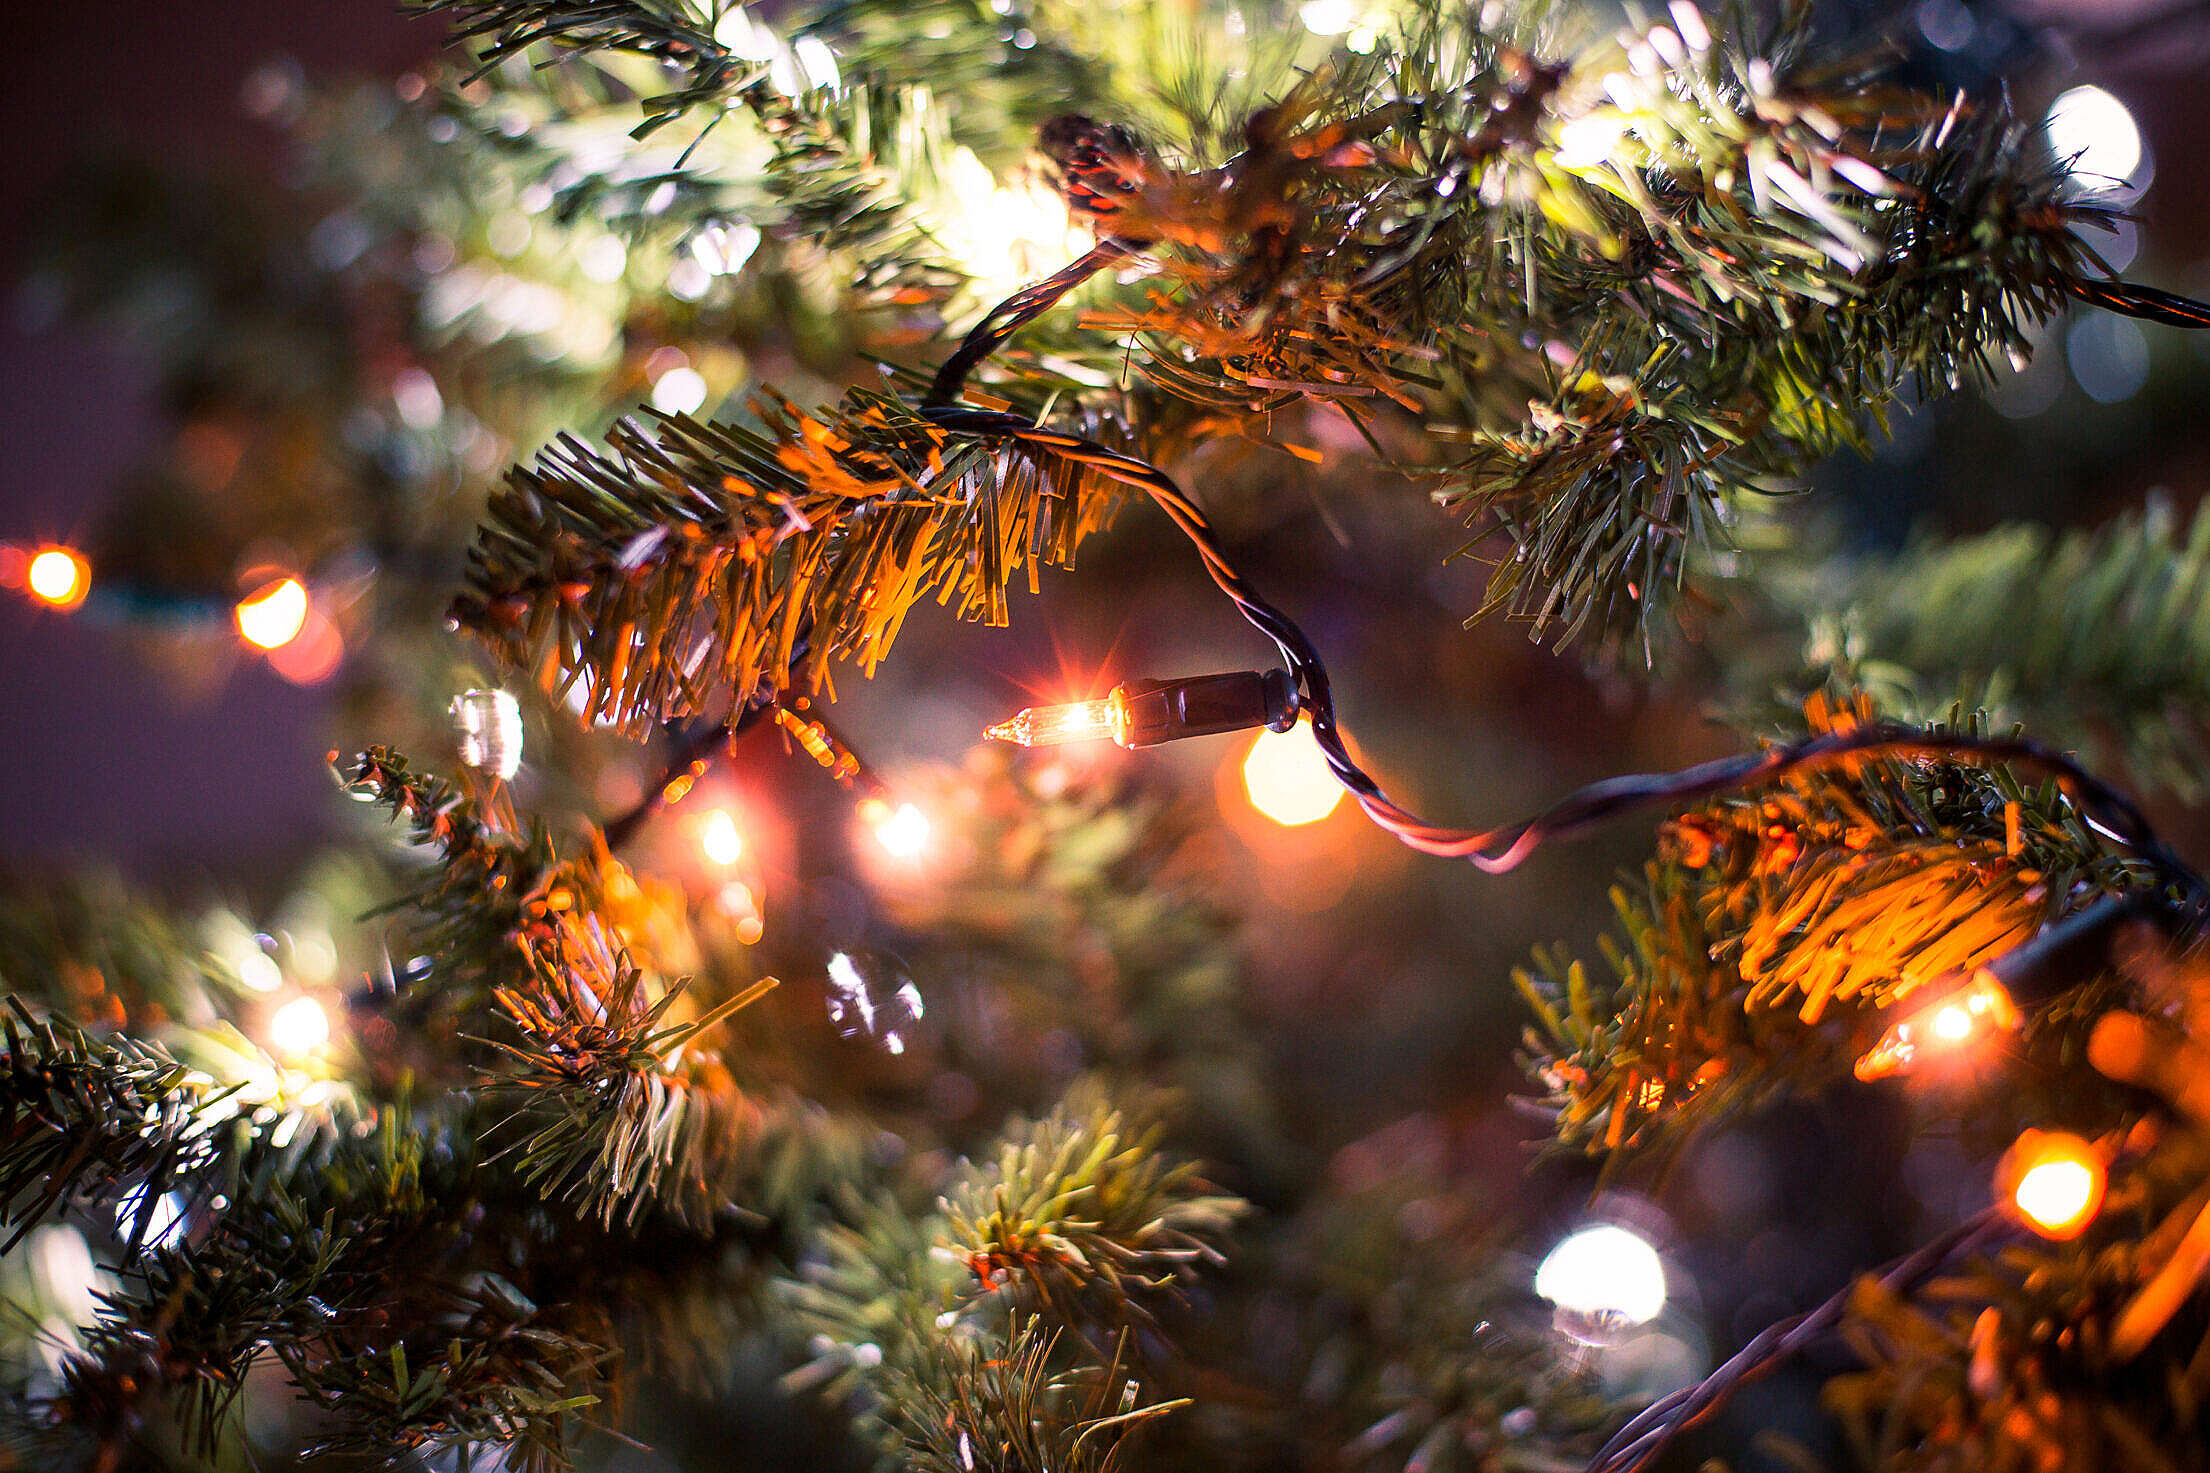 Christmas Lights Close Up Free Stock Photo